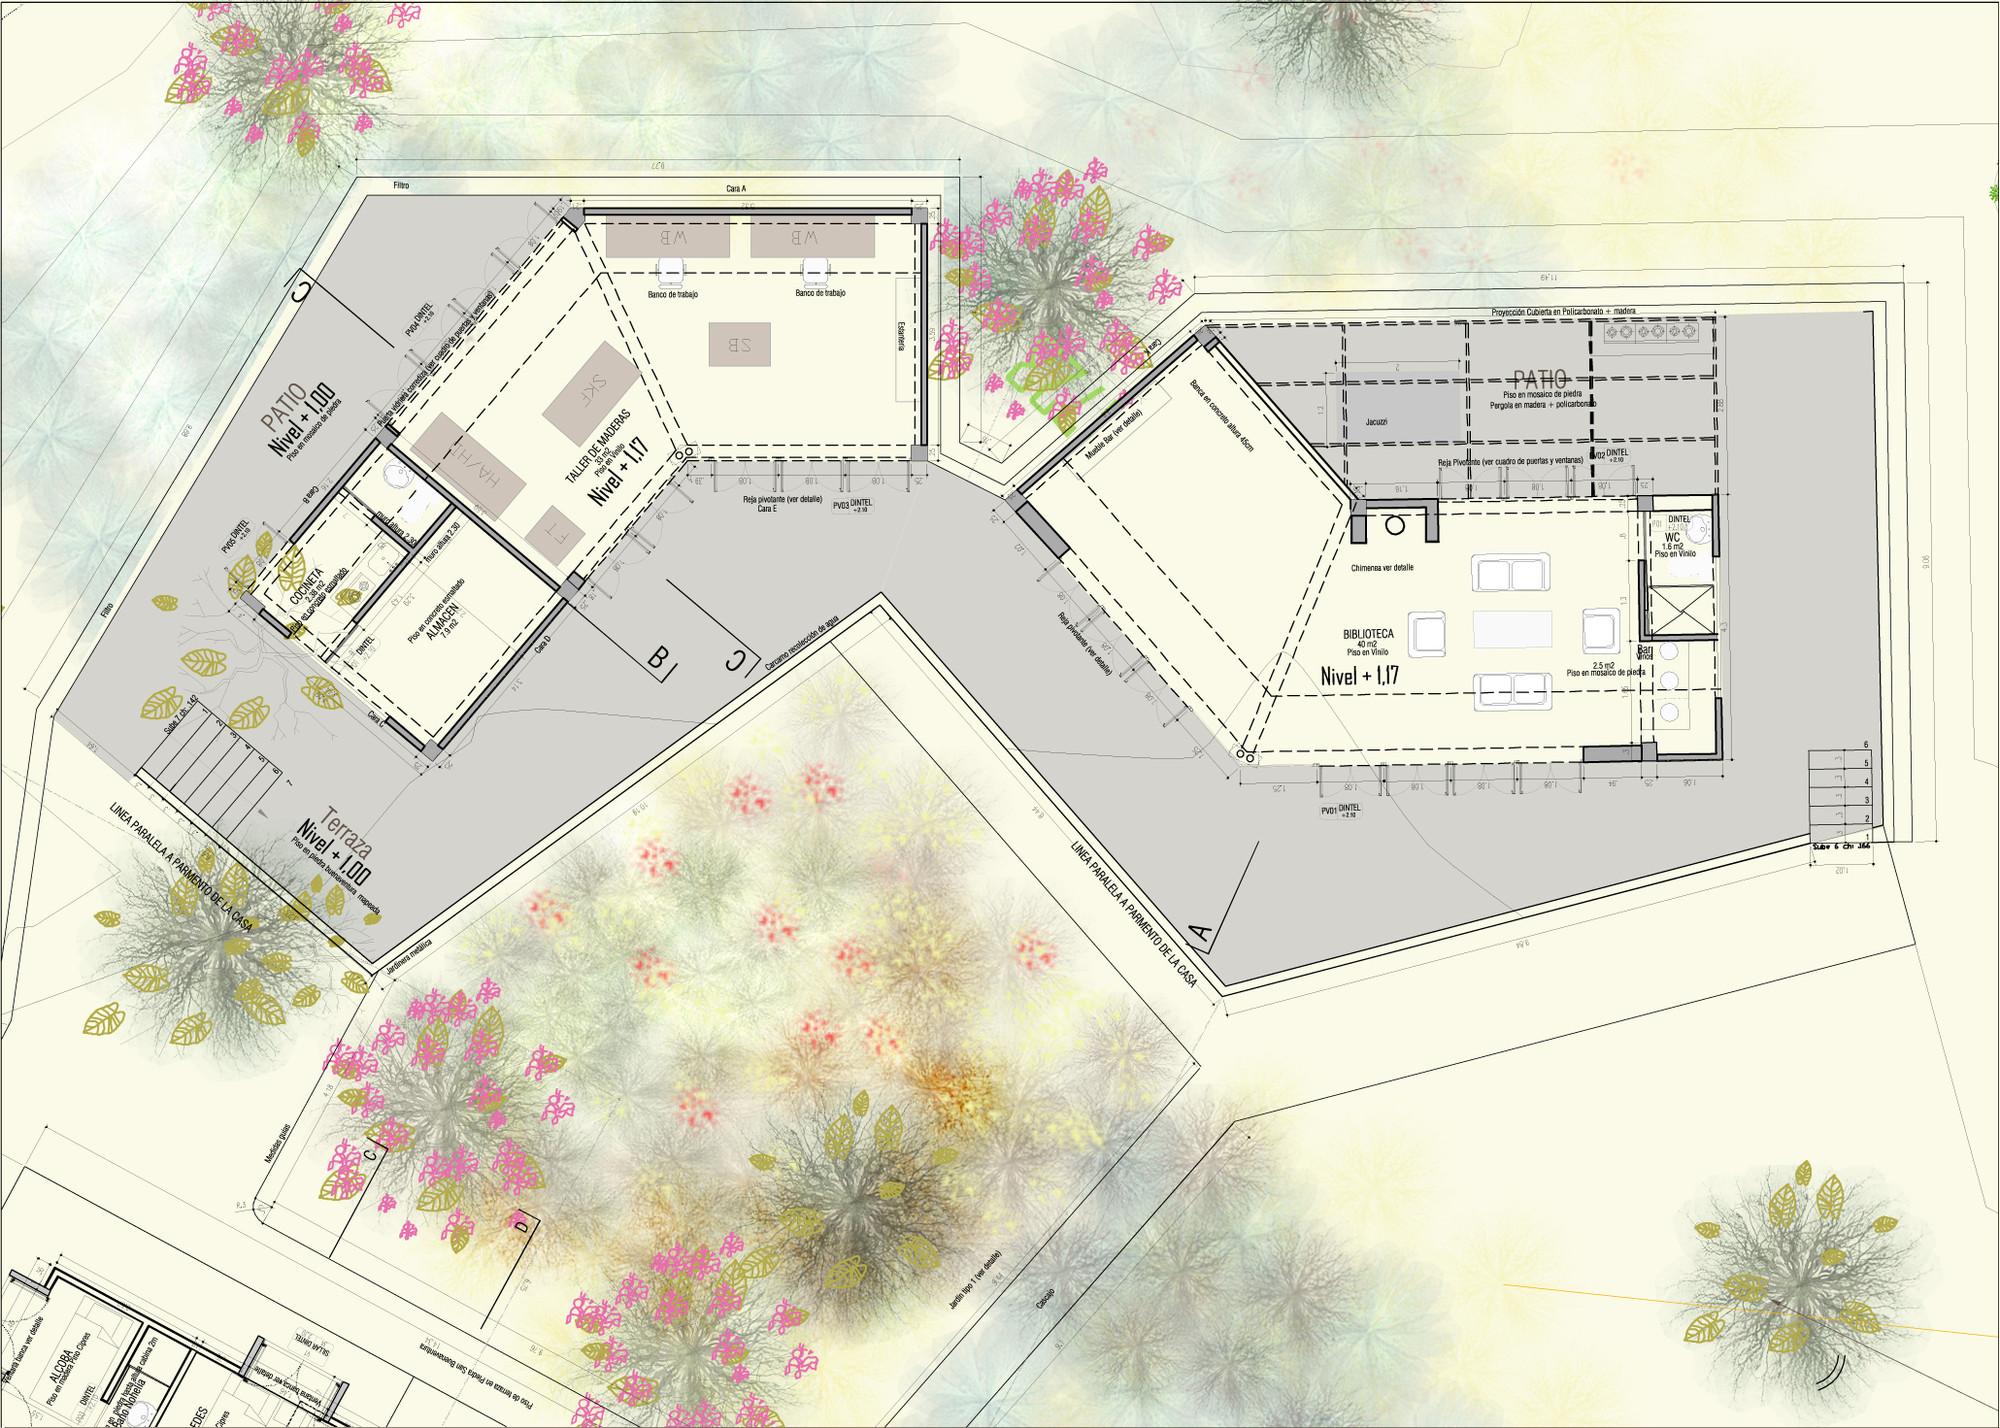 Cadaluja reforma de una casa campesina ctrl g for Plataforma arquitectura